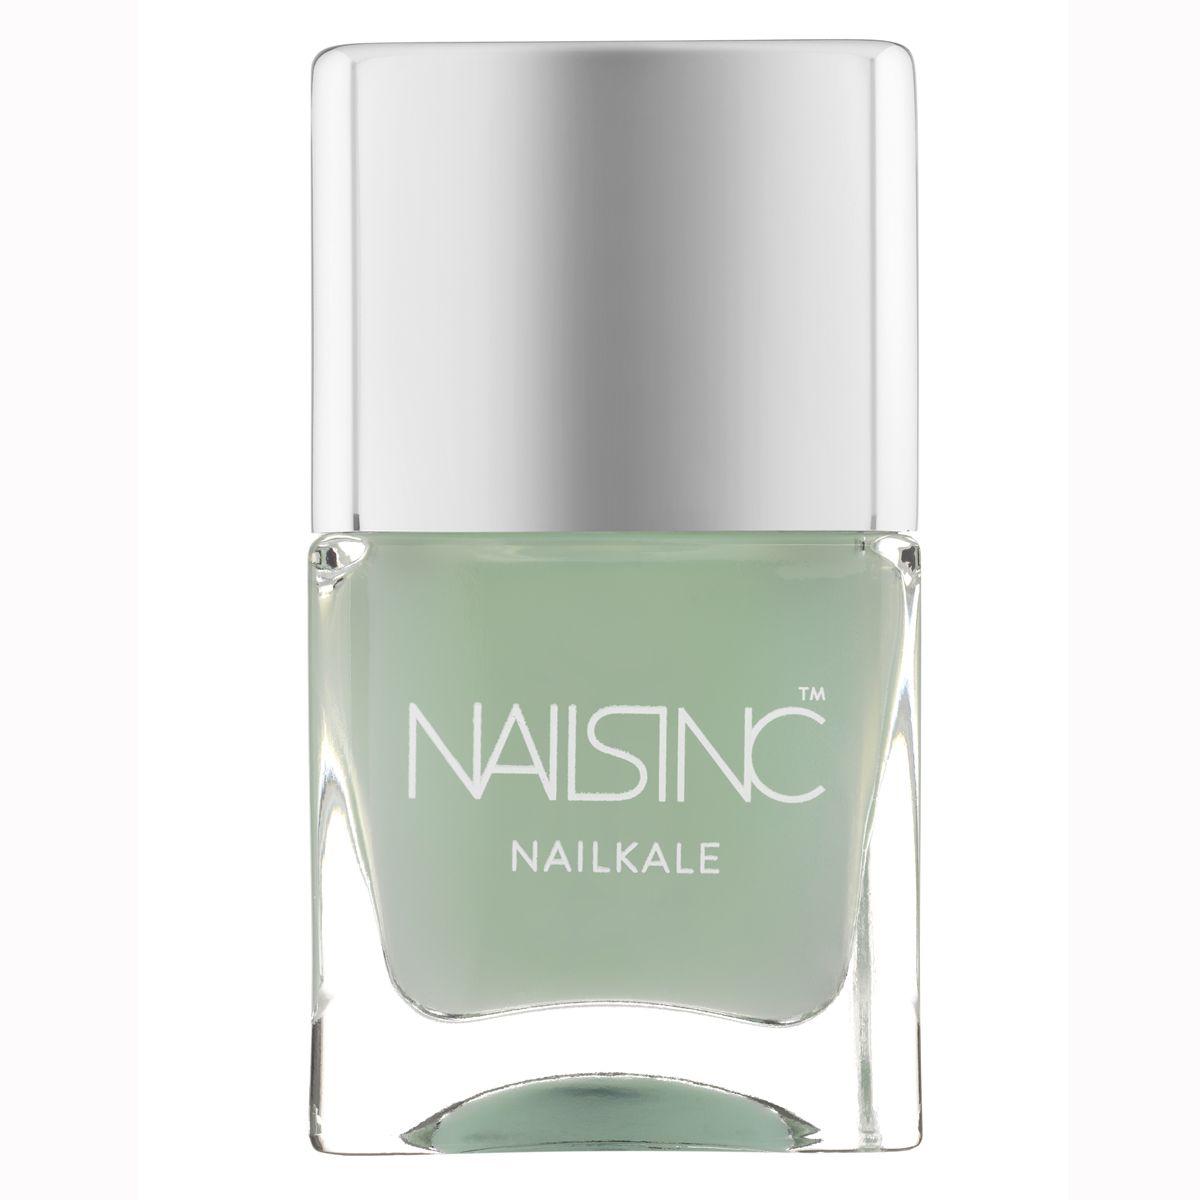 5 nail polish brands that are good for your nails | Nail polish ...